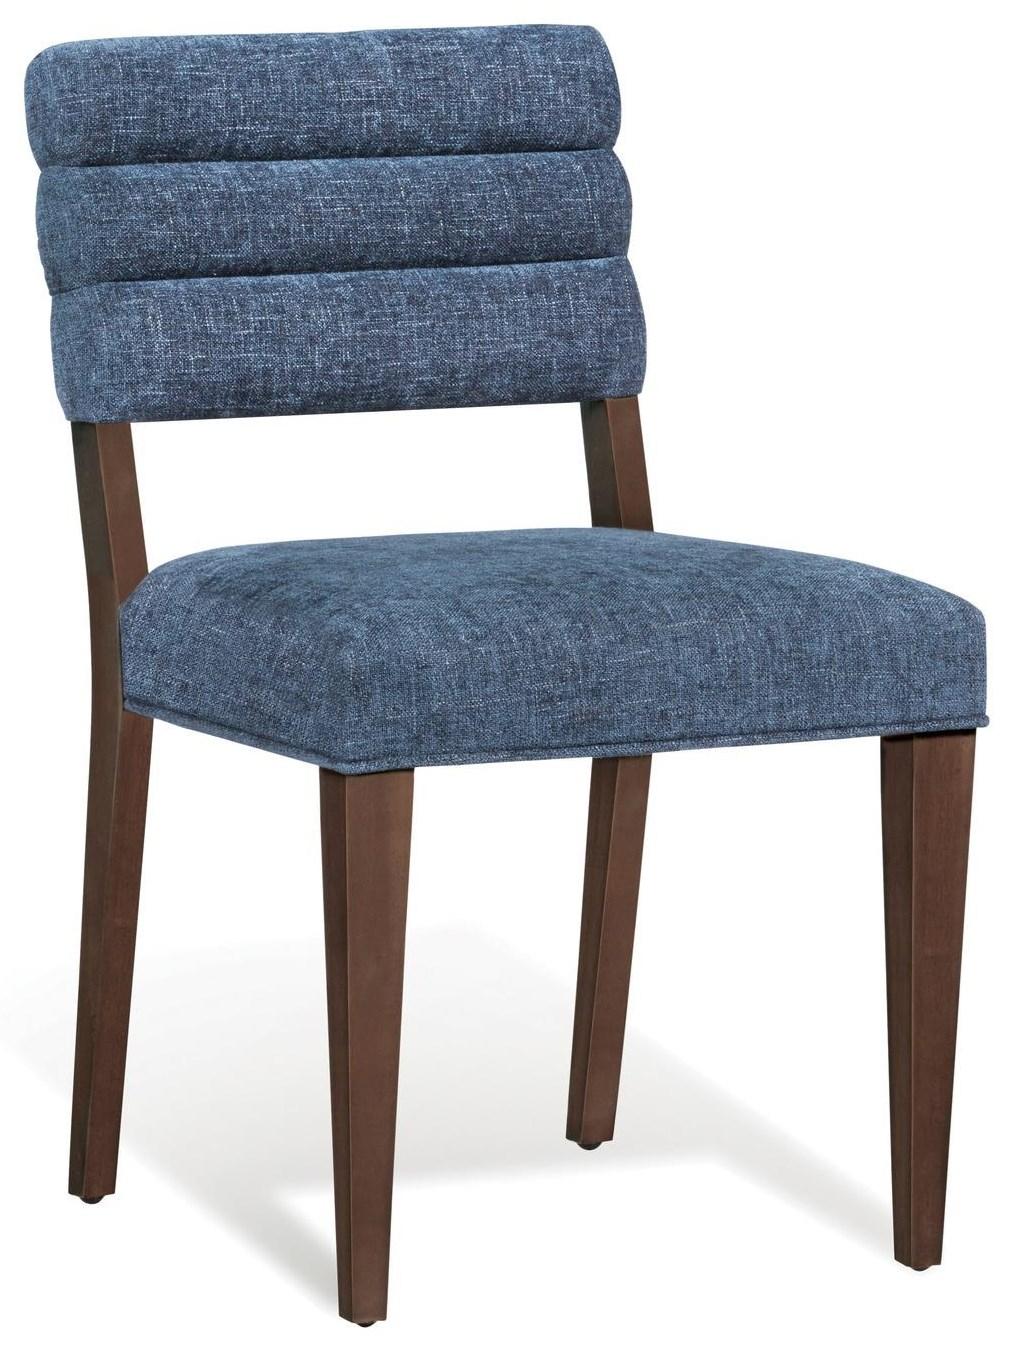 Sarah Richardson Boulevard Boulevard Plaza Chair by Palliser at Stoney Creek Furniture